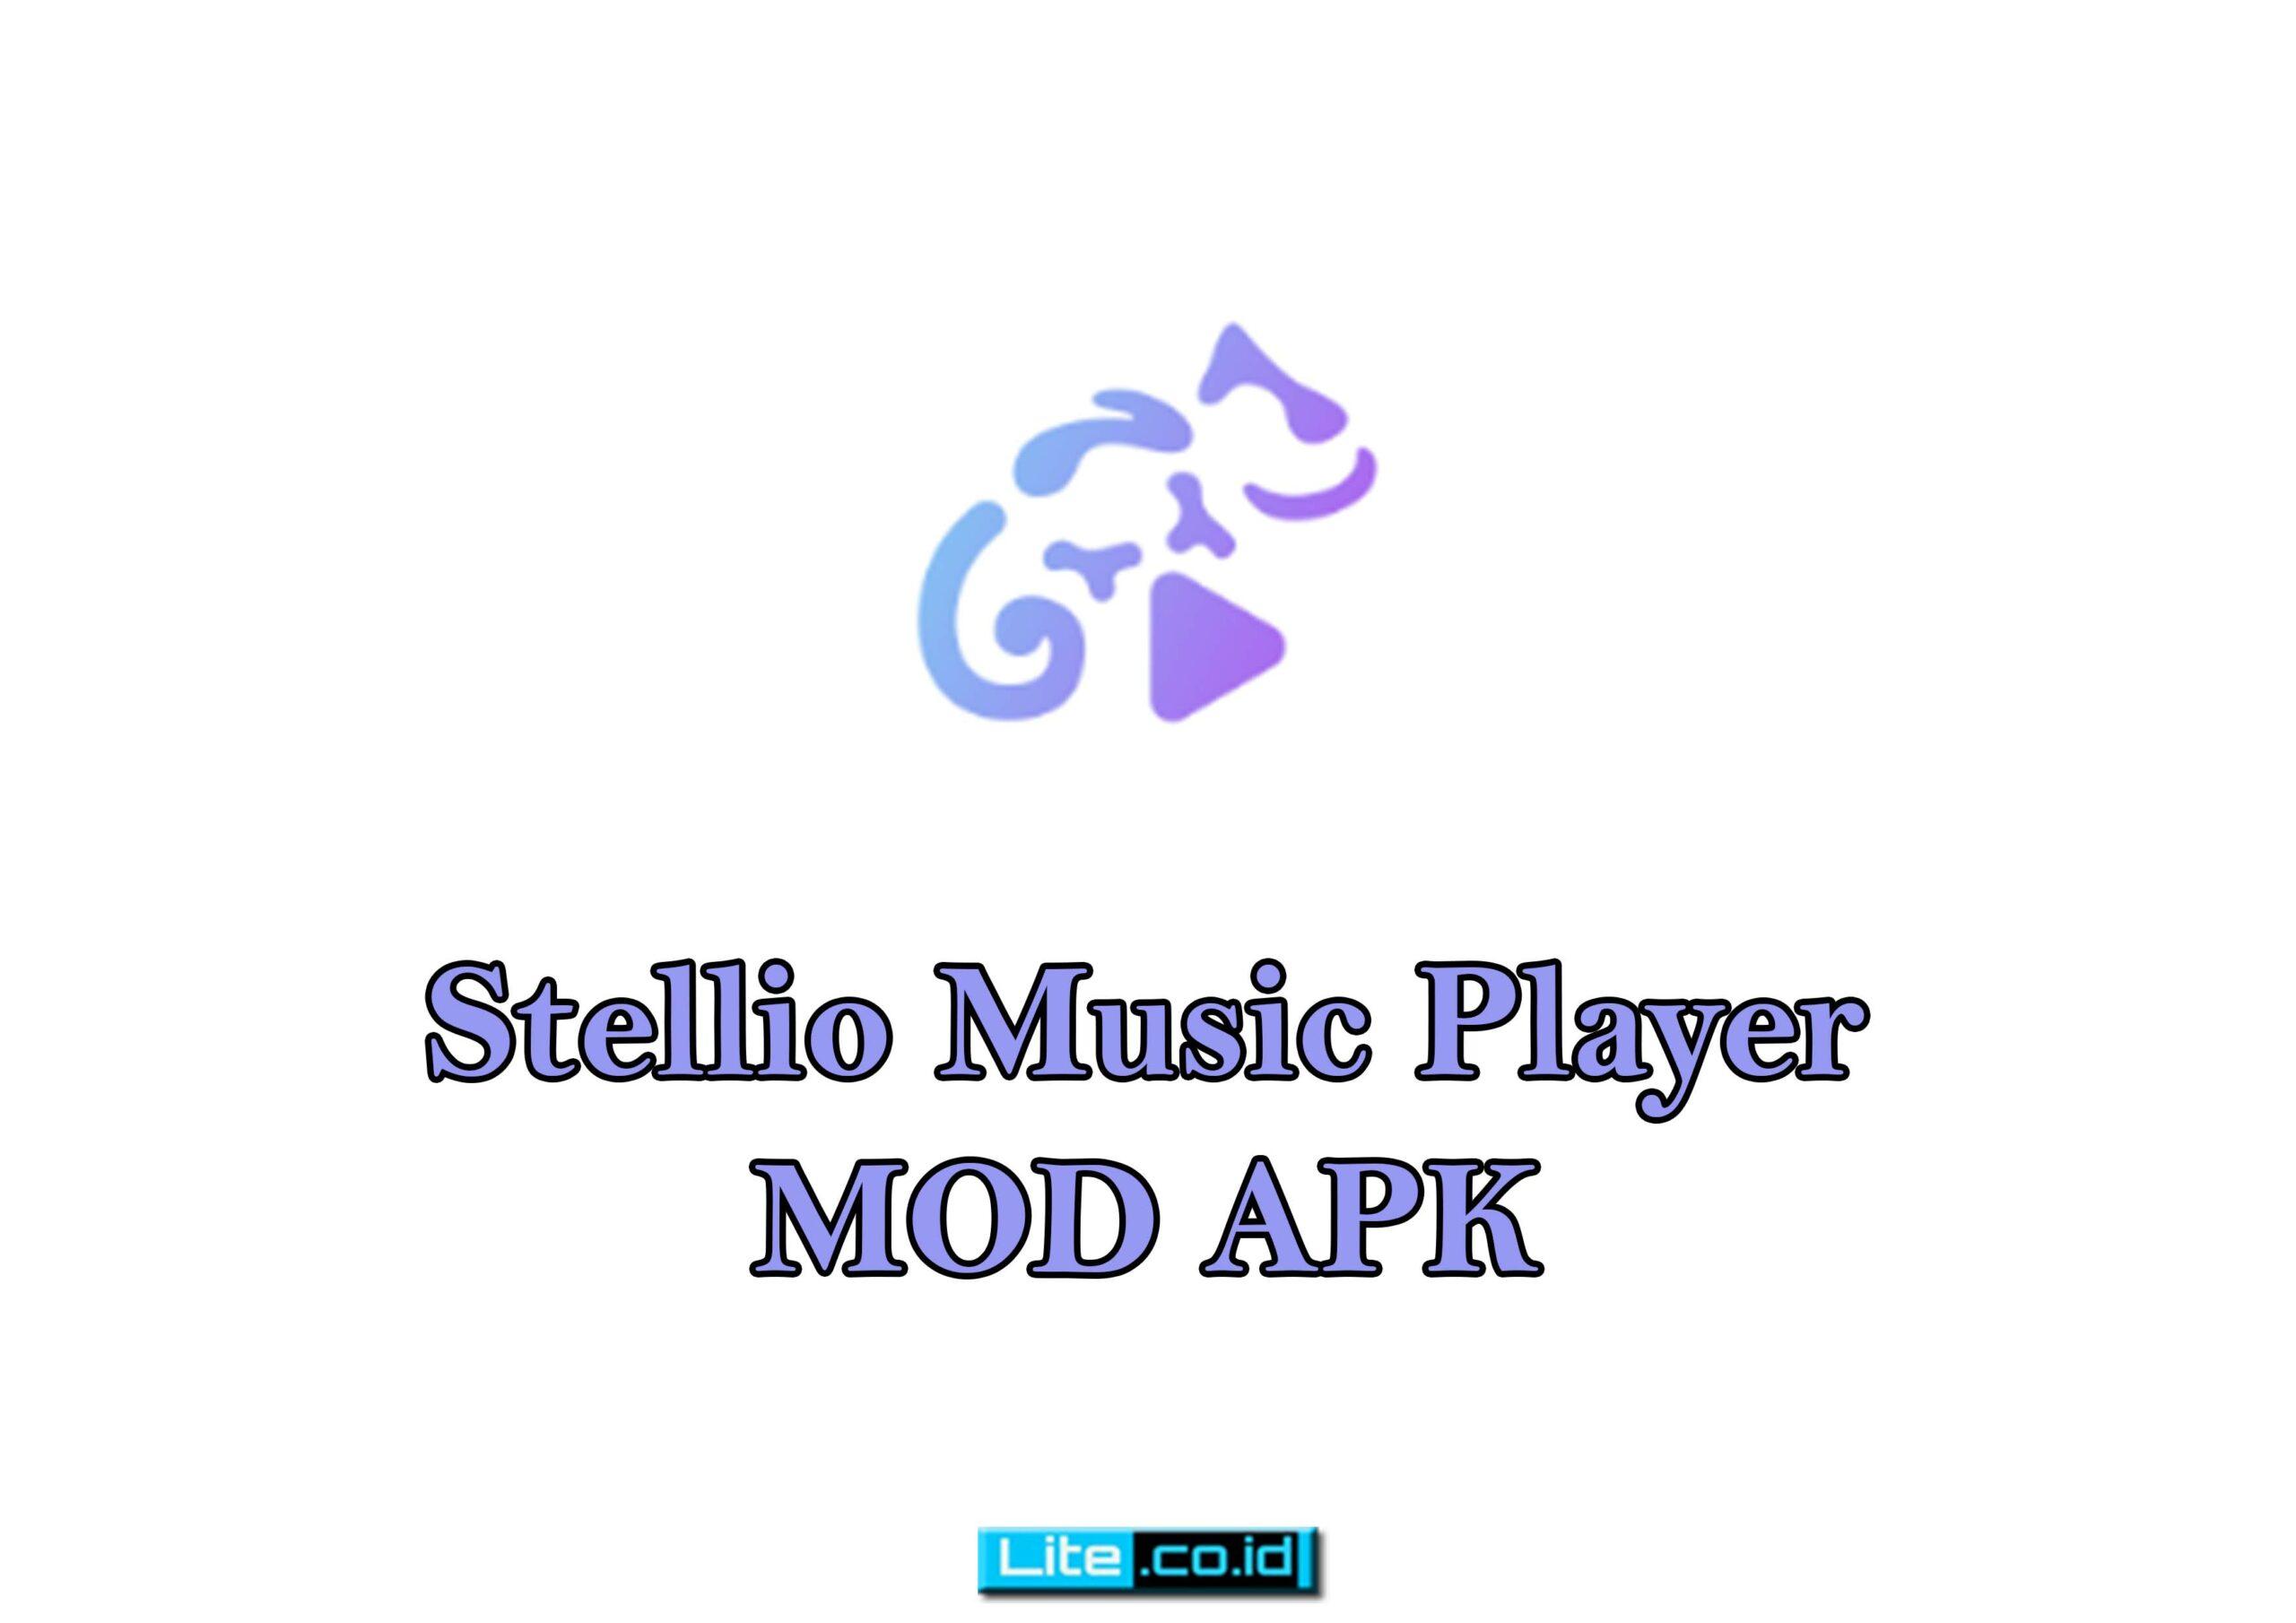 Stellio Music Player